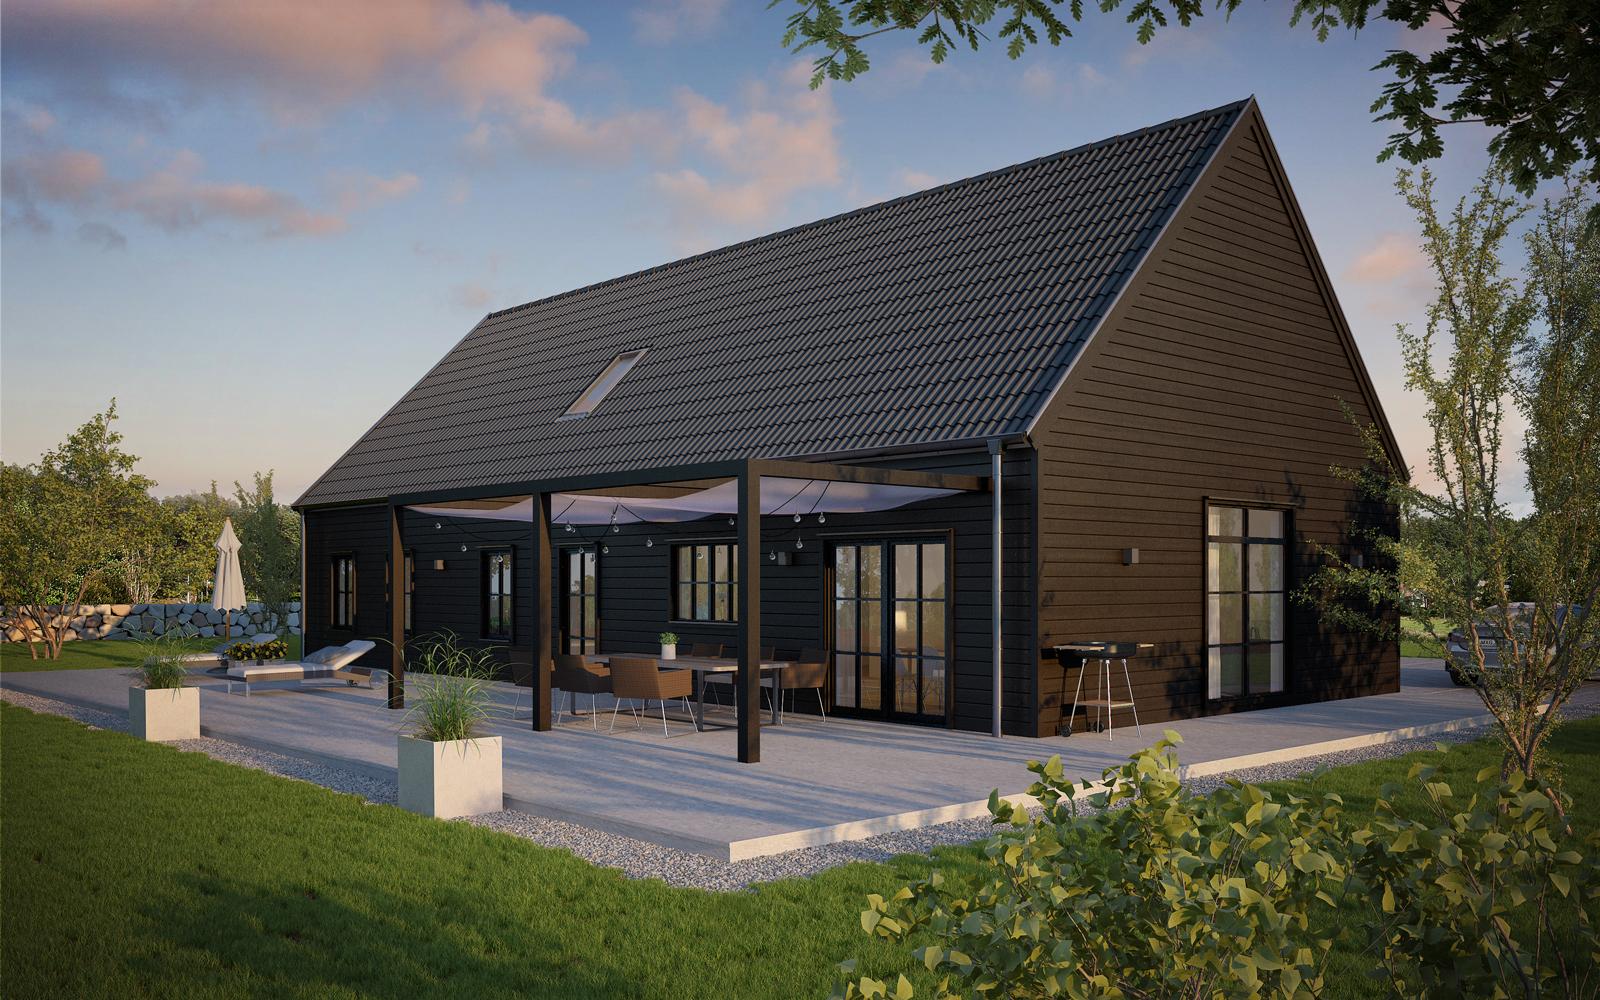 Villa Hagalund  1,5-planshus Boyta 138,1 m2  (oinredd vind + 59,2 m)  3 sovrum